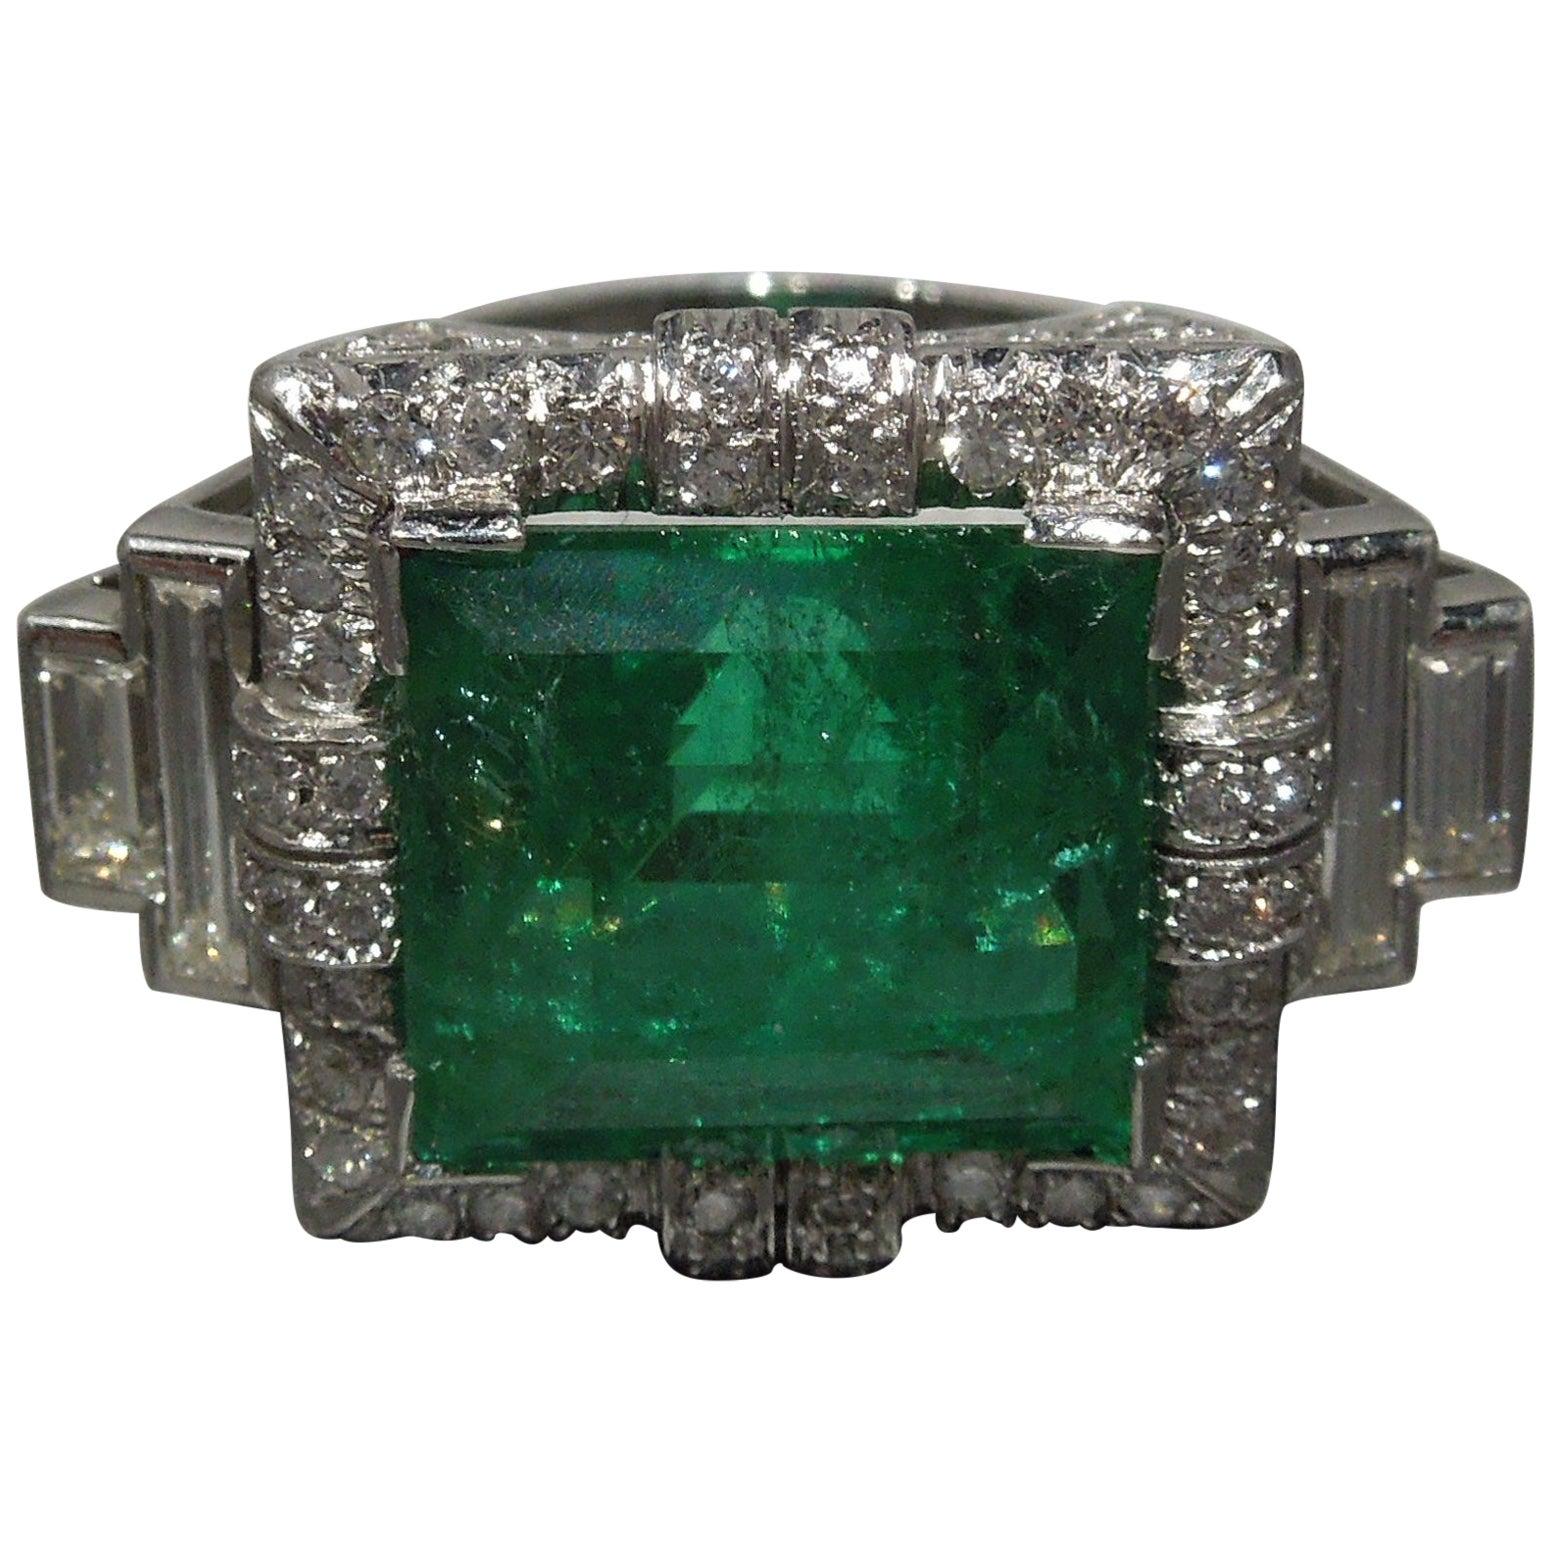 Art Deco Defined 12.75 Carat GIA Colombian Emerald Platinum Ring